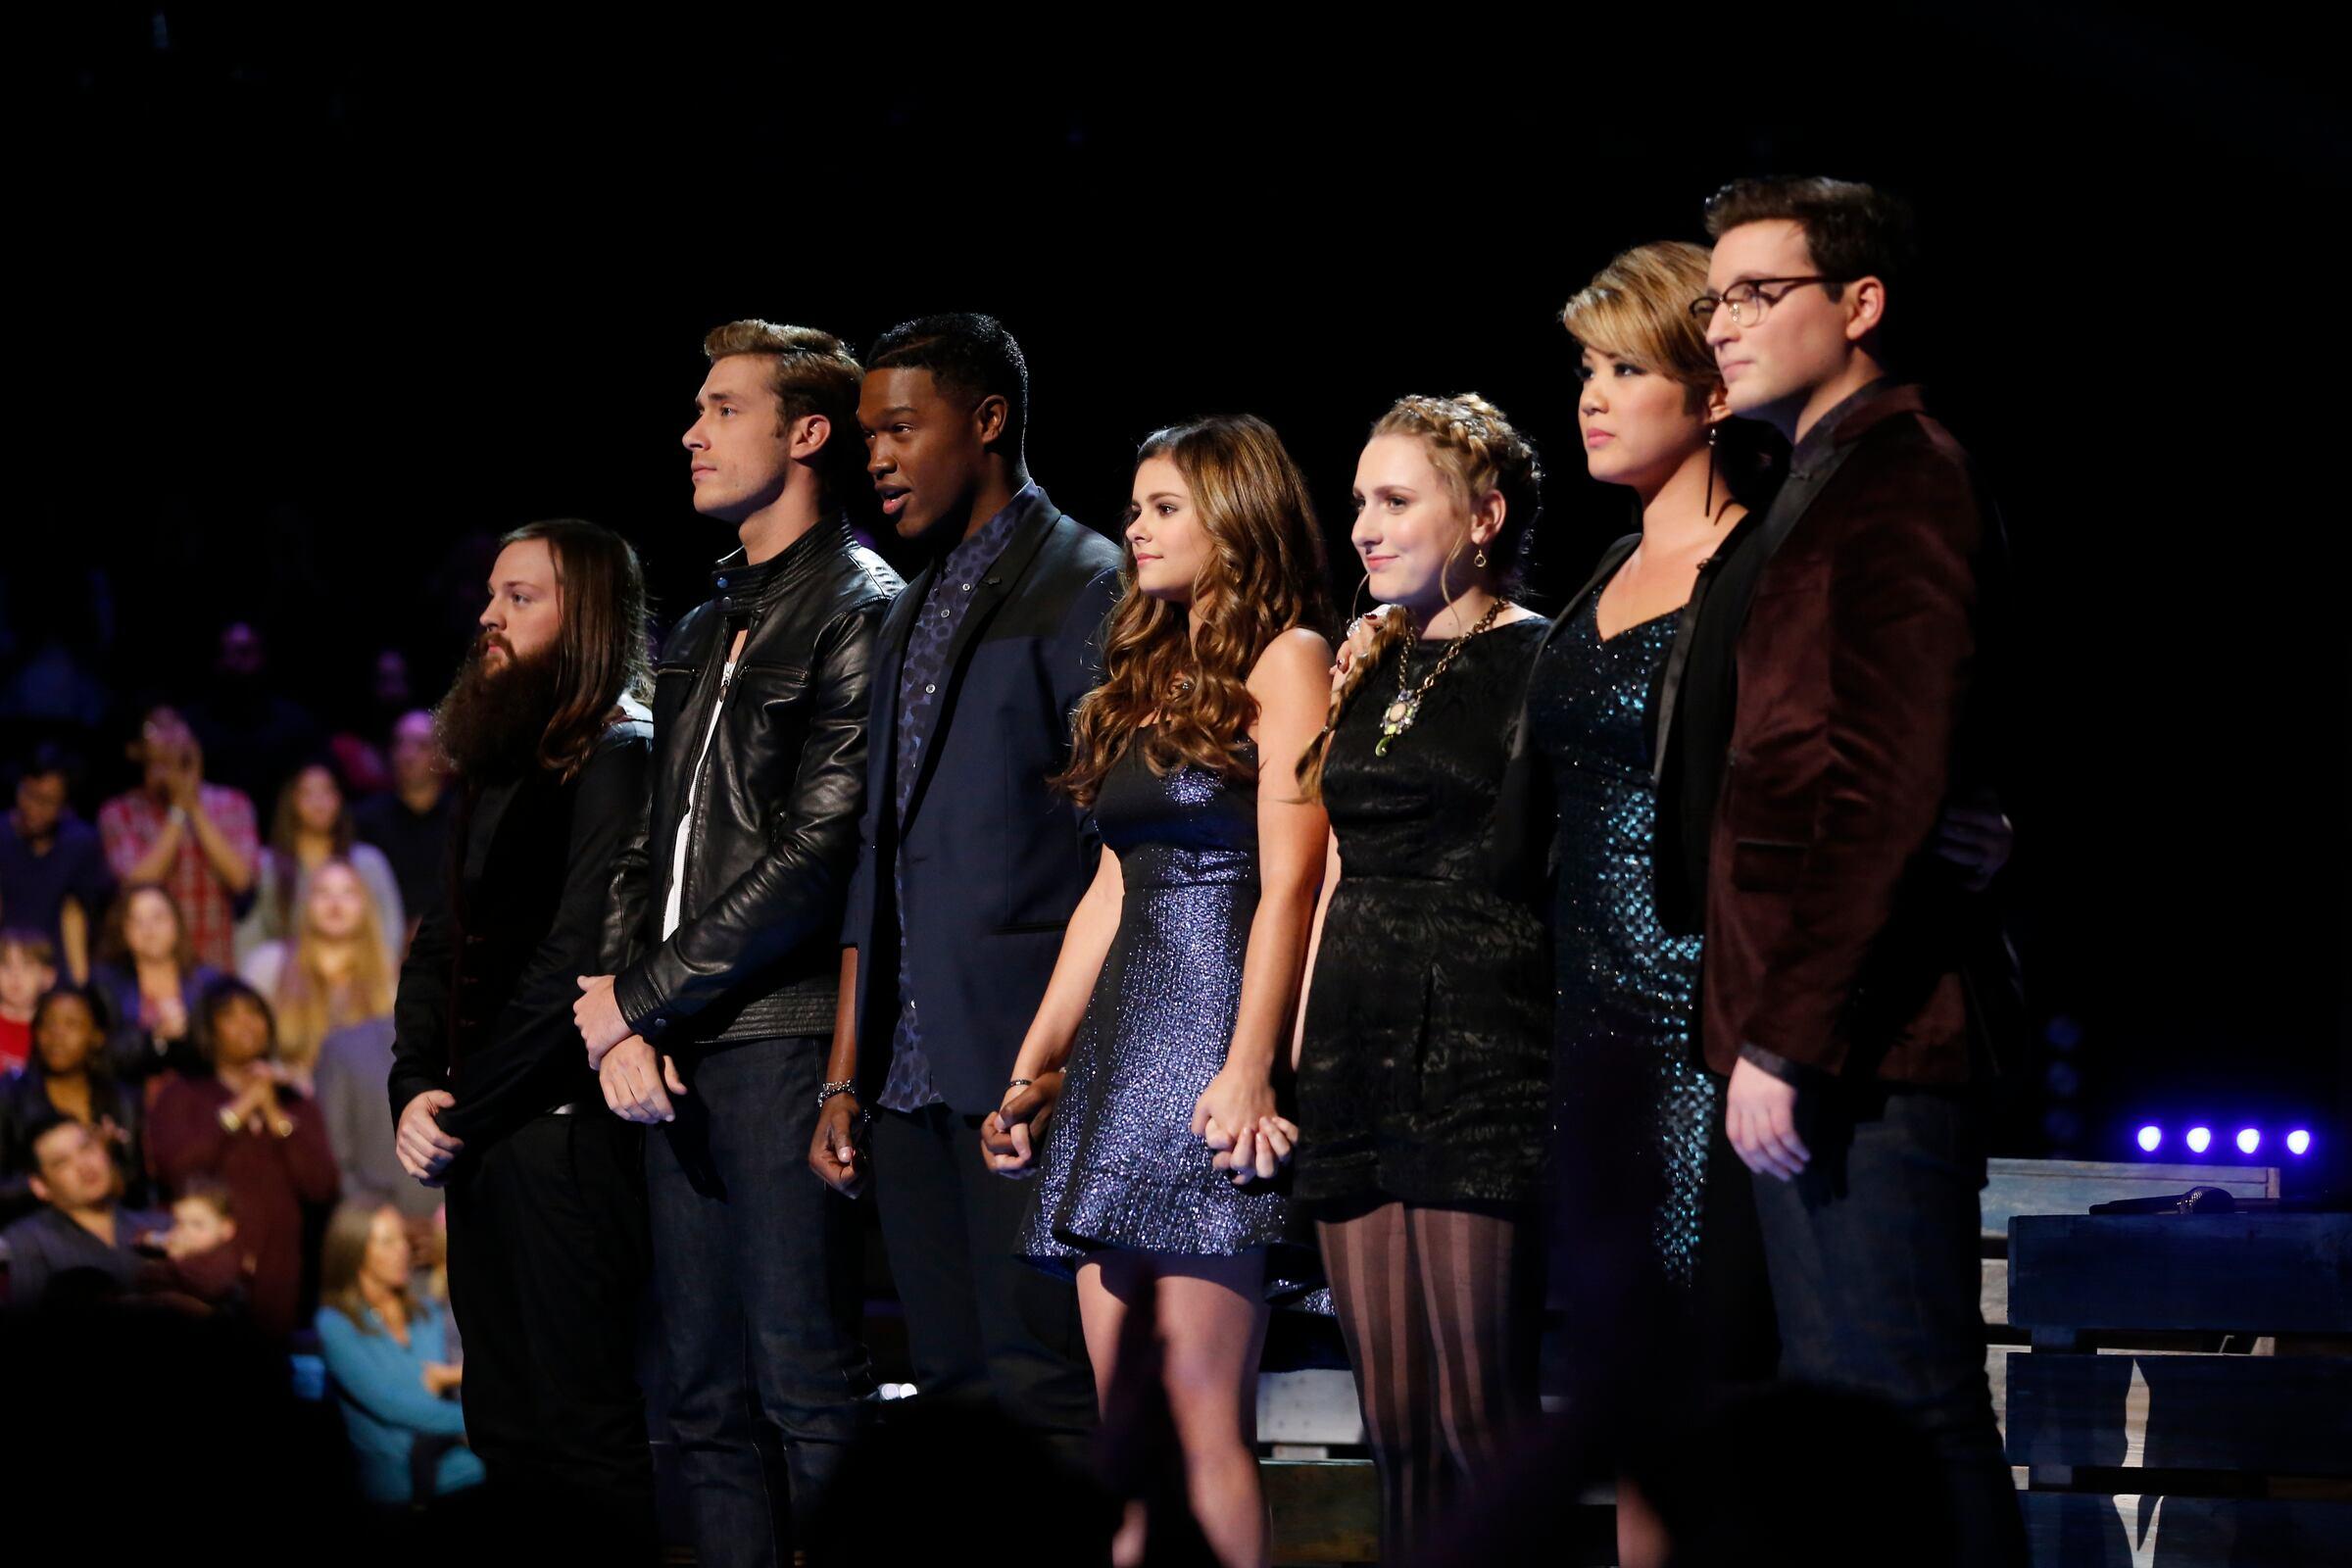 "THE VOICE -- ""Live Show"" Episode 516B -- Pictured: (l-r) Cole Vosbury, Ray Boudreaux, Matthew Schuler, Jacquie Lee, Caroline Pennell, Tessanne Chin, James Wolpert -- (Photo by: Trae Patton/NBC)"